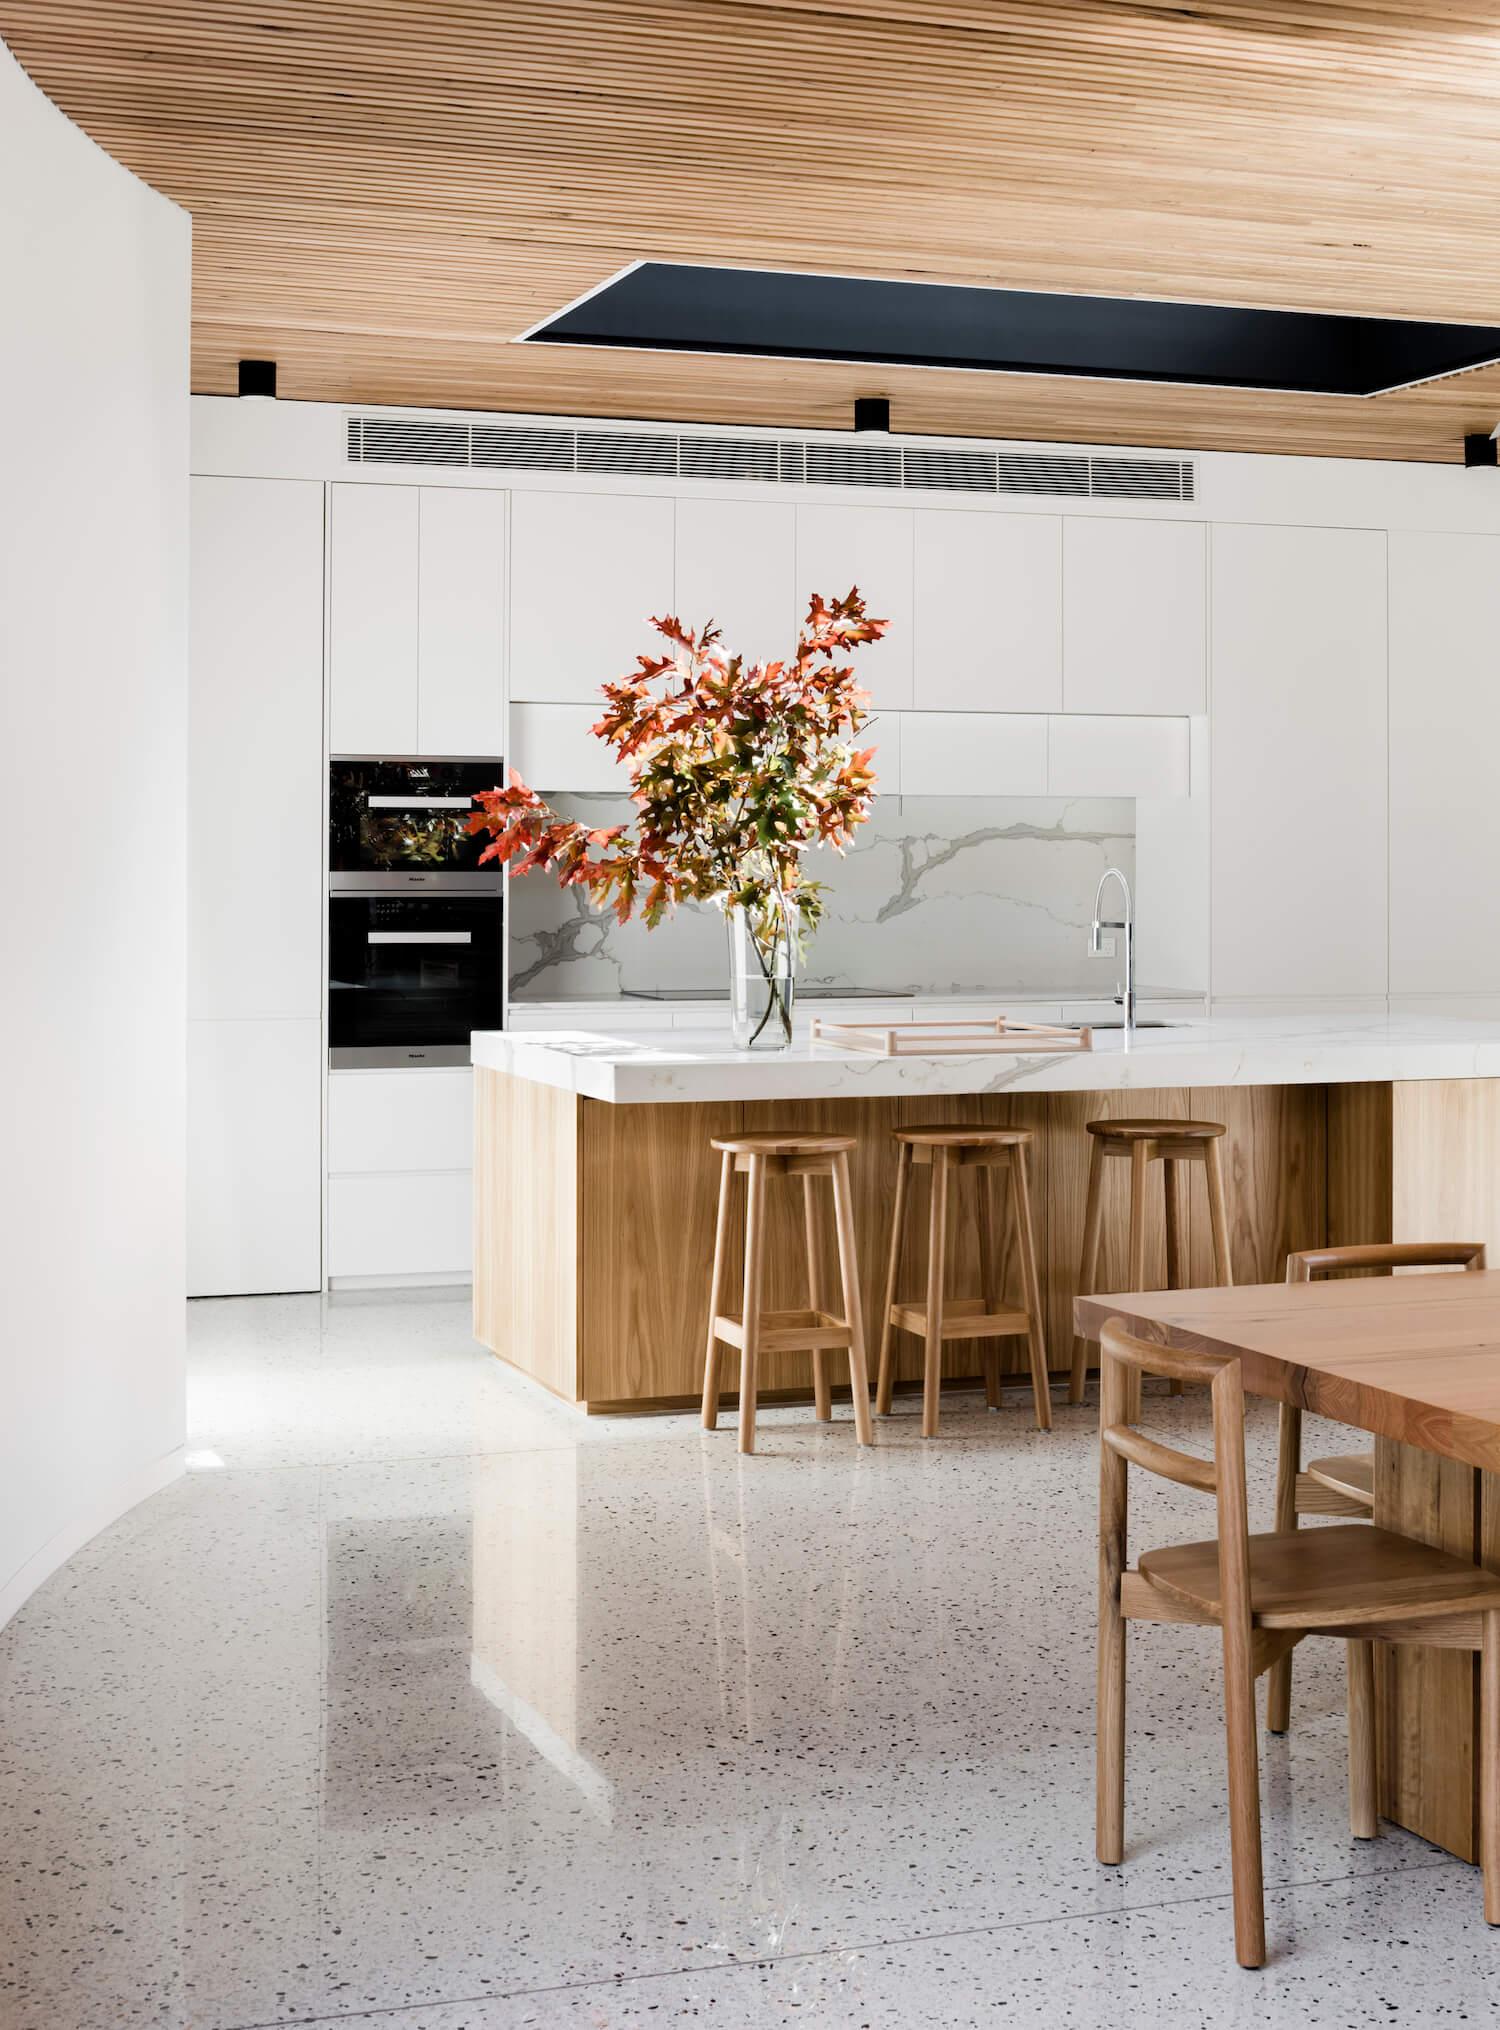 est-living-interiors-figr-architecture-courtyard-house-5.jpg